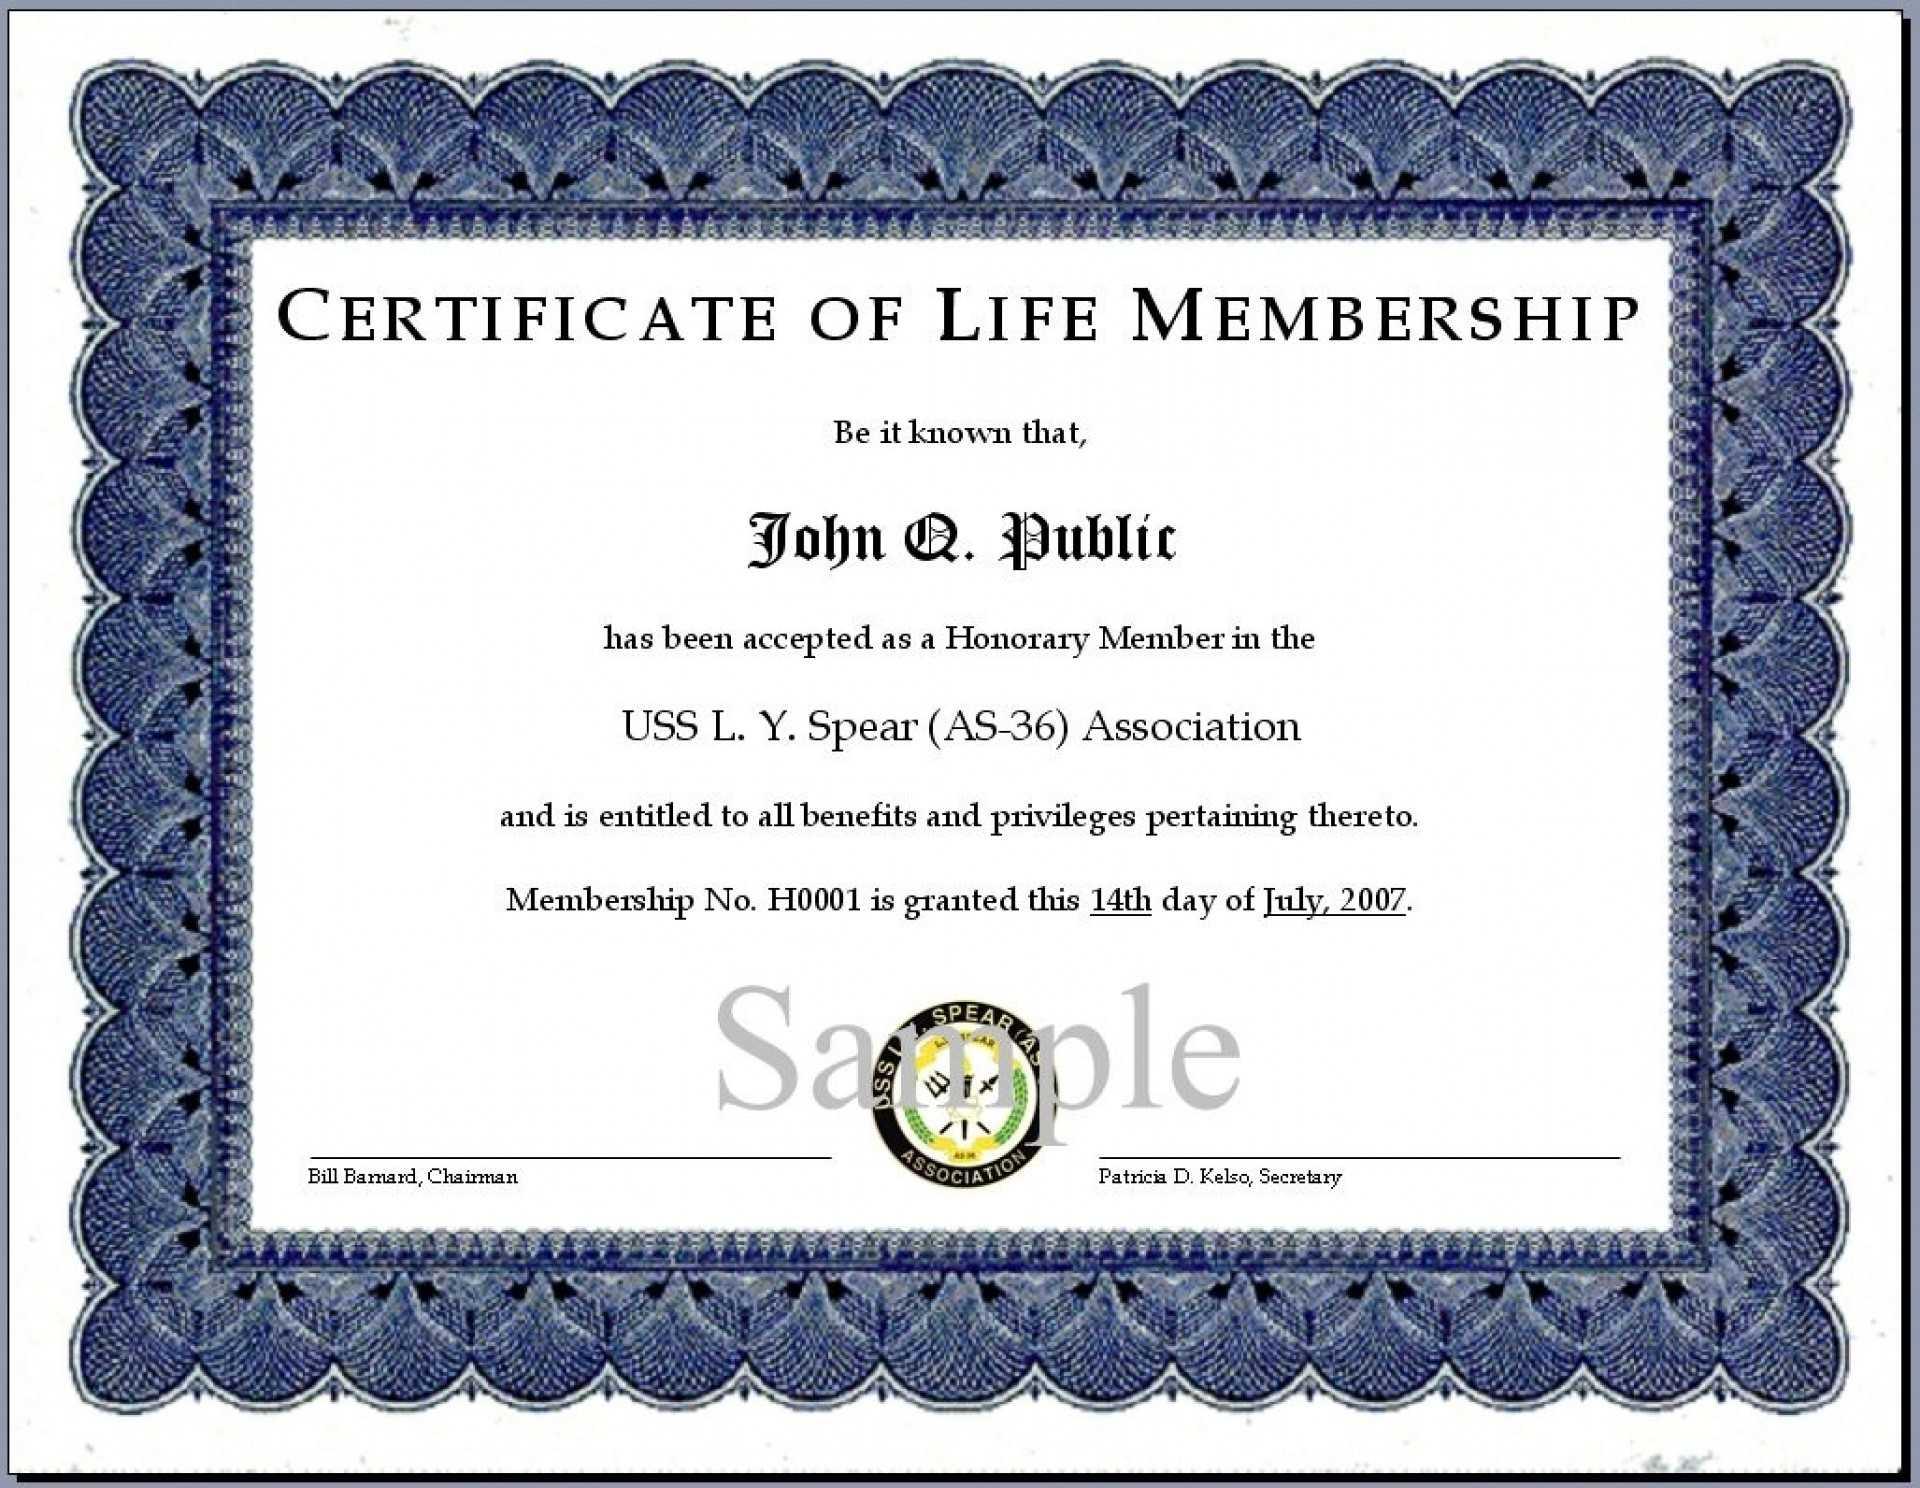 014 Church Transfer Letter Unique Llc Member Certificate Regarding Life Membership Certificate Templates